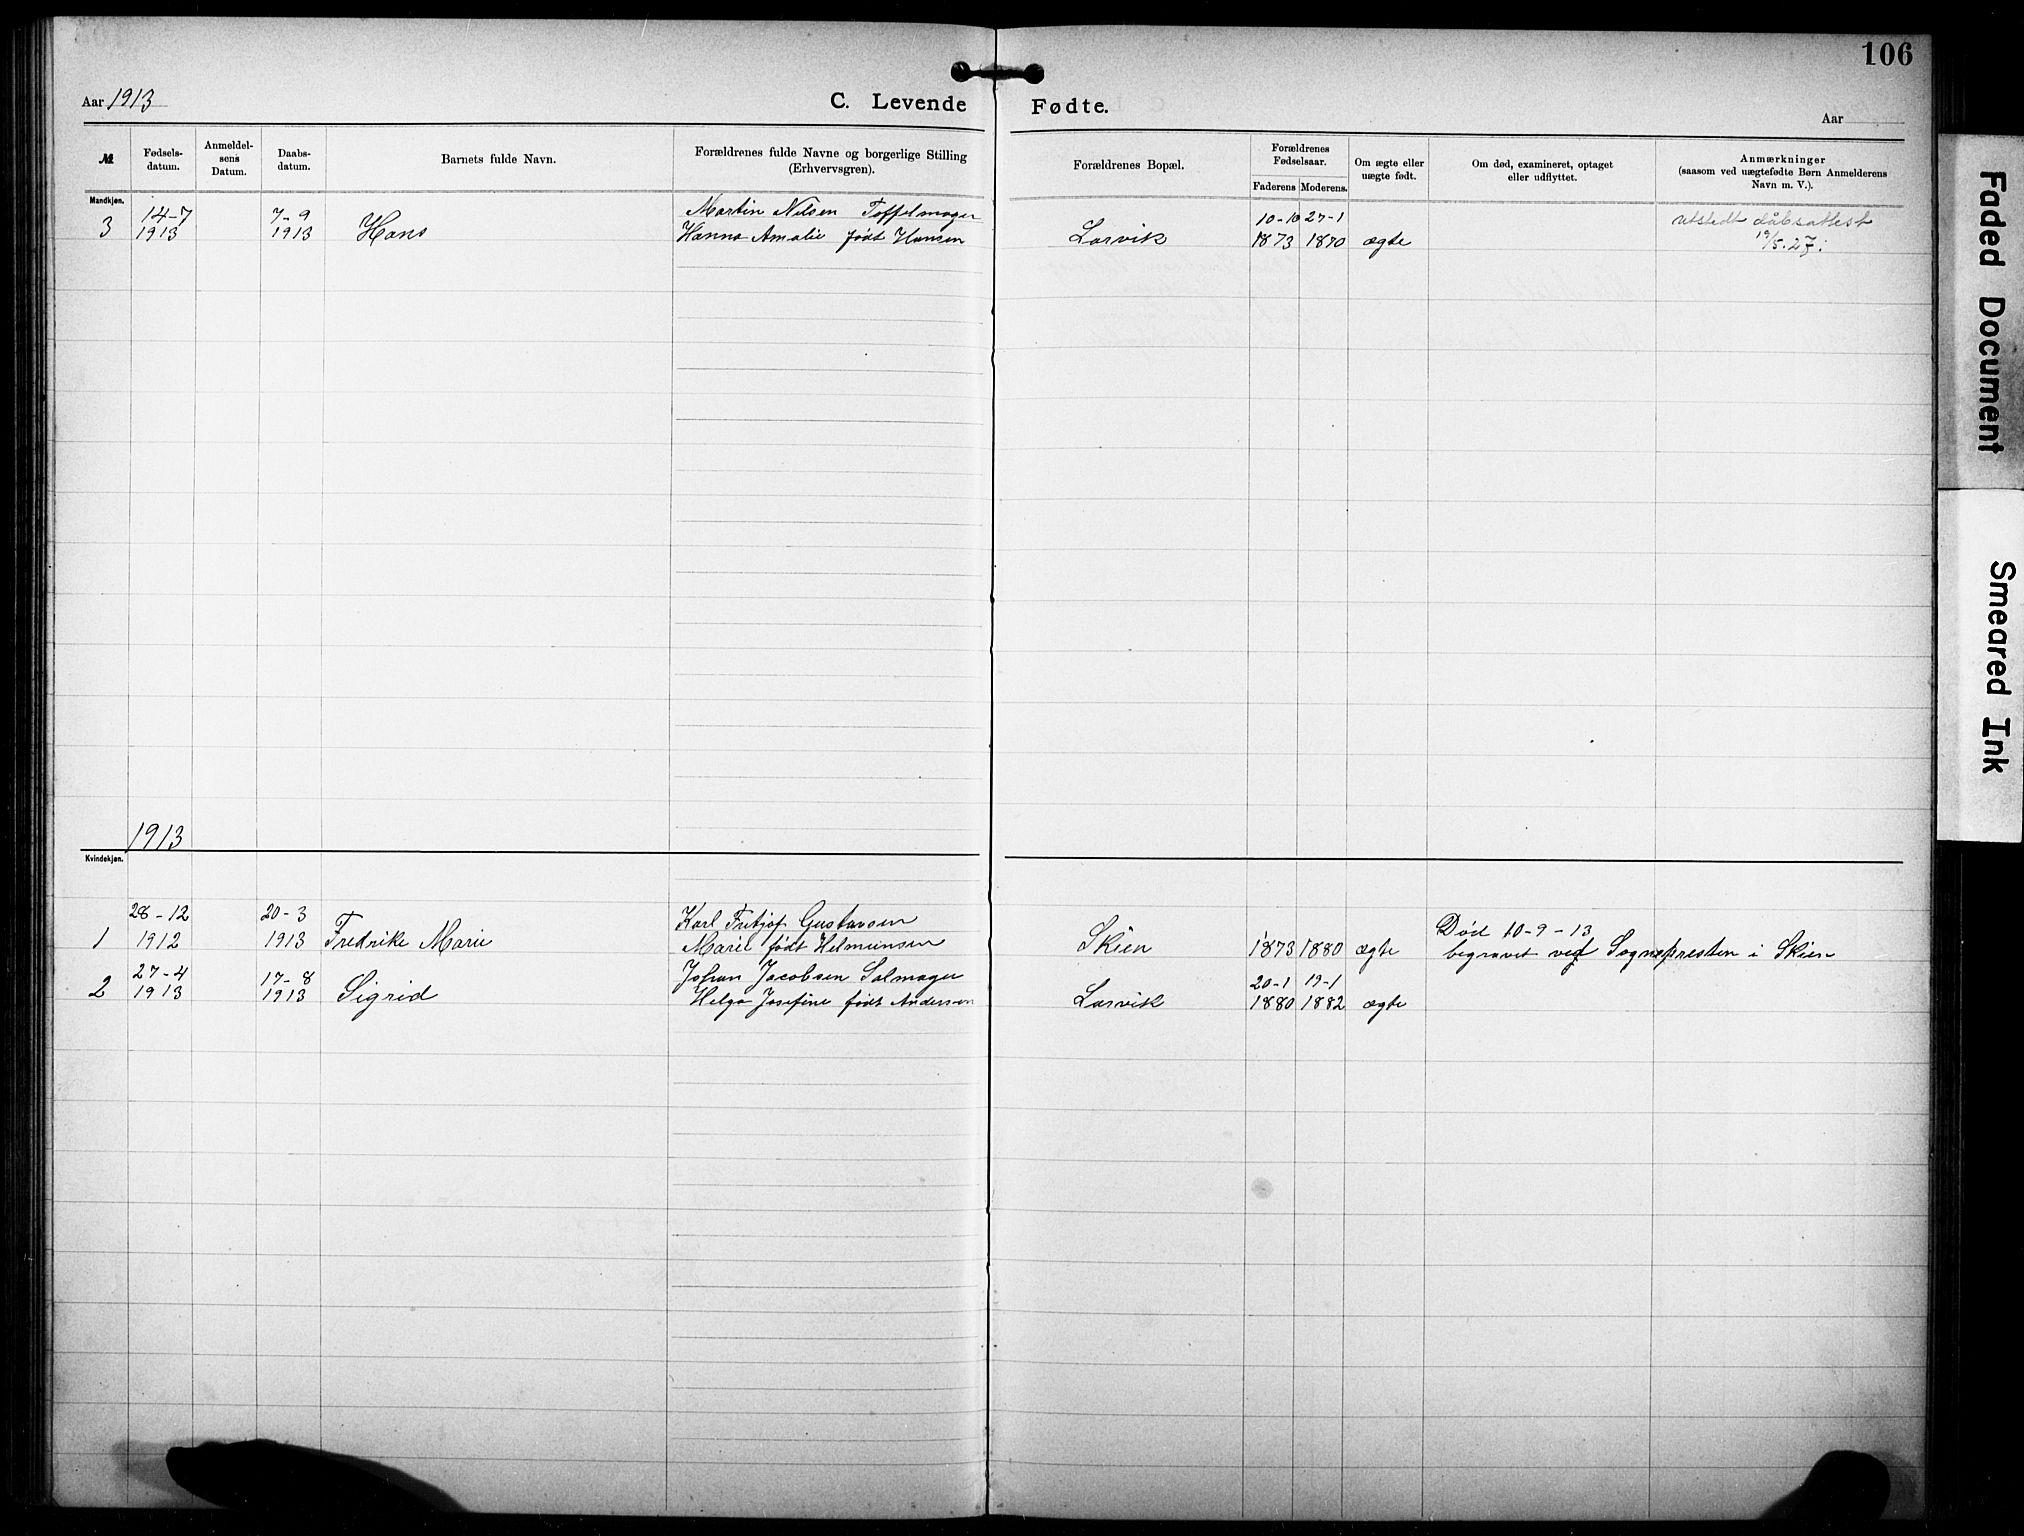 SAKO, Den katolsk-apostoliske menighet i Larvik, F/Fa/L0001: Dissenter register no. 1, 1892-1933, p. 106